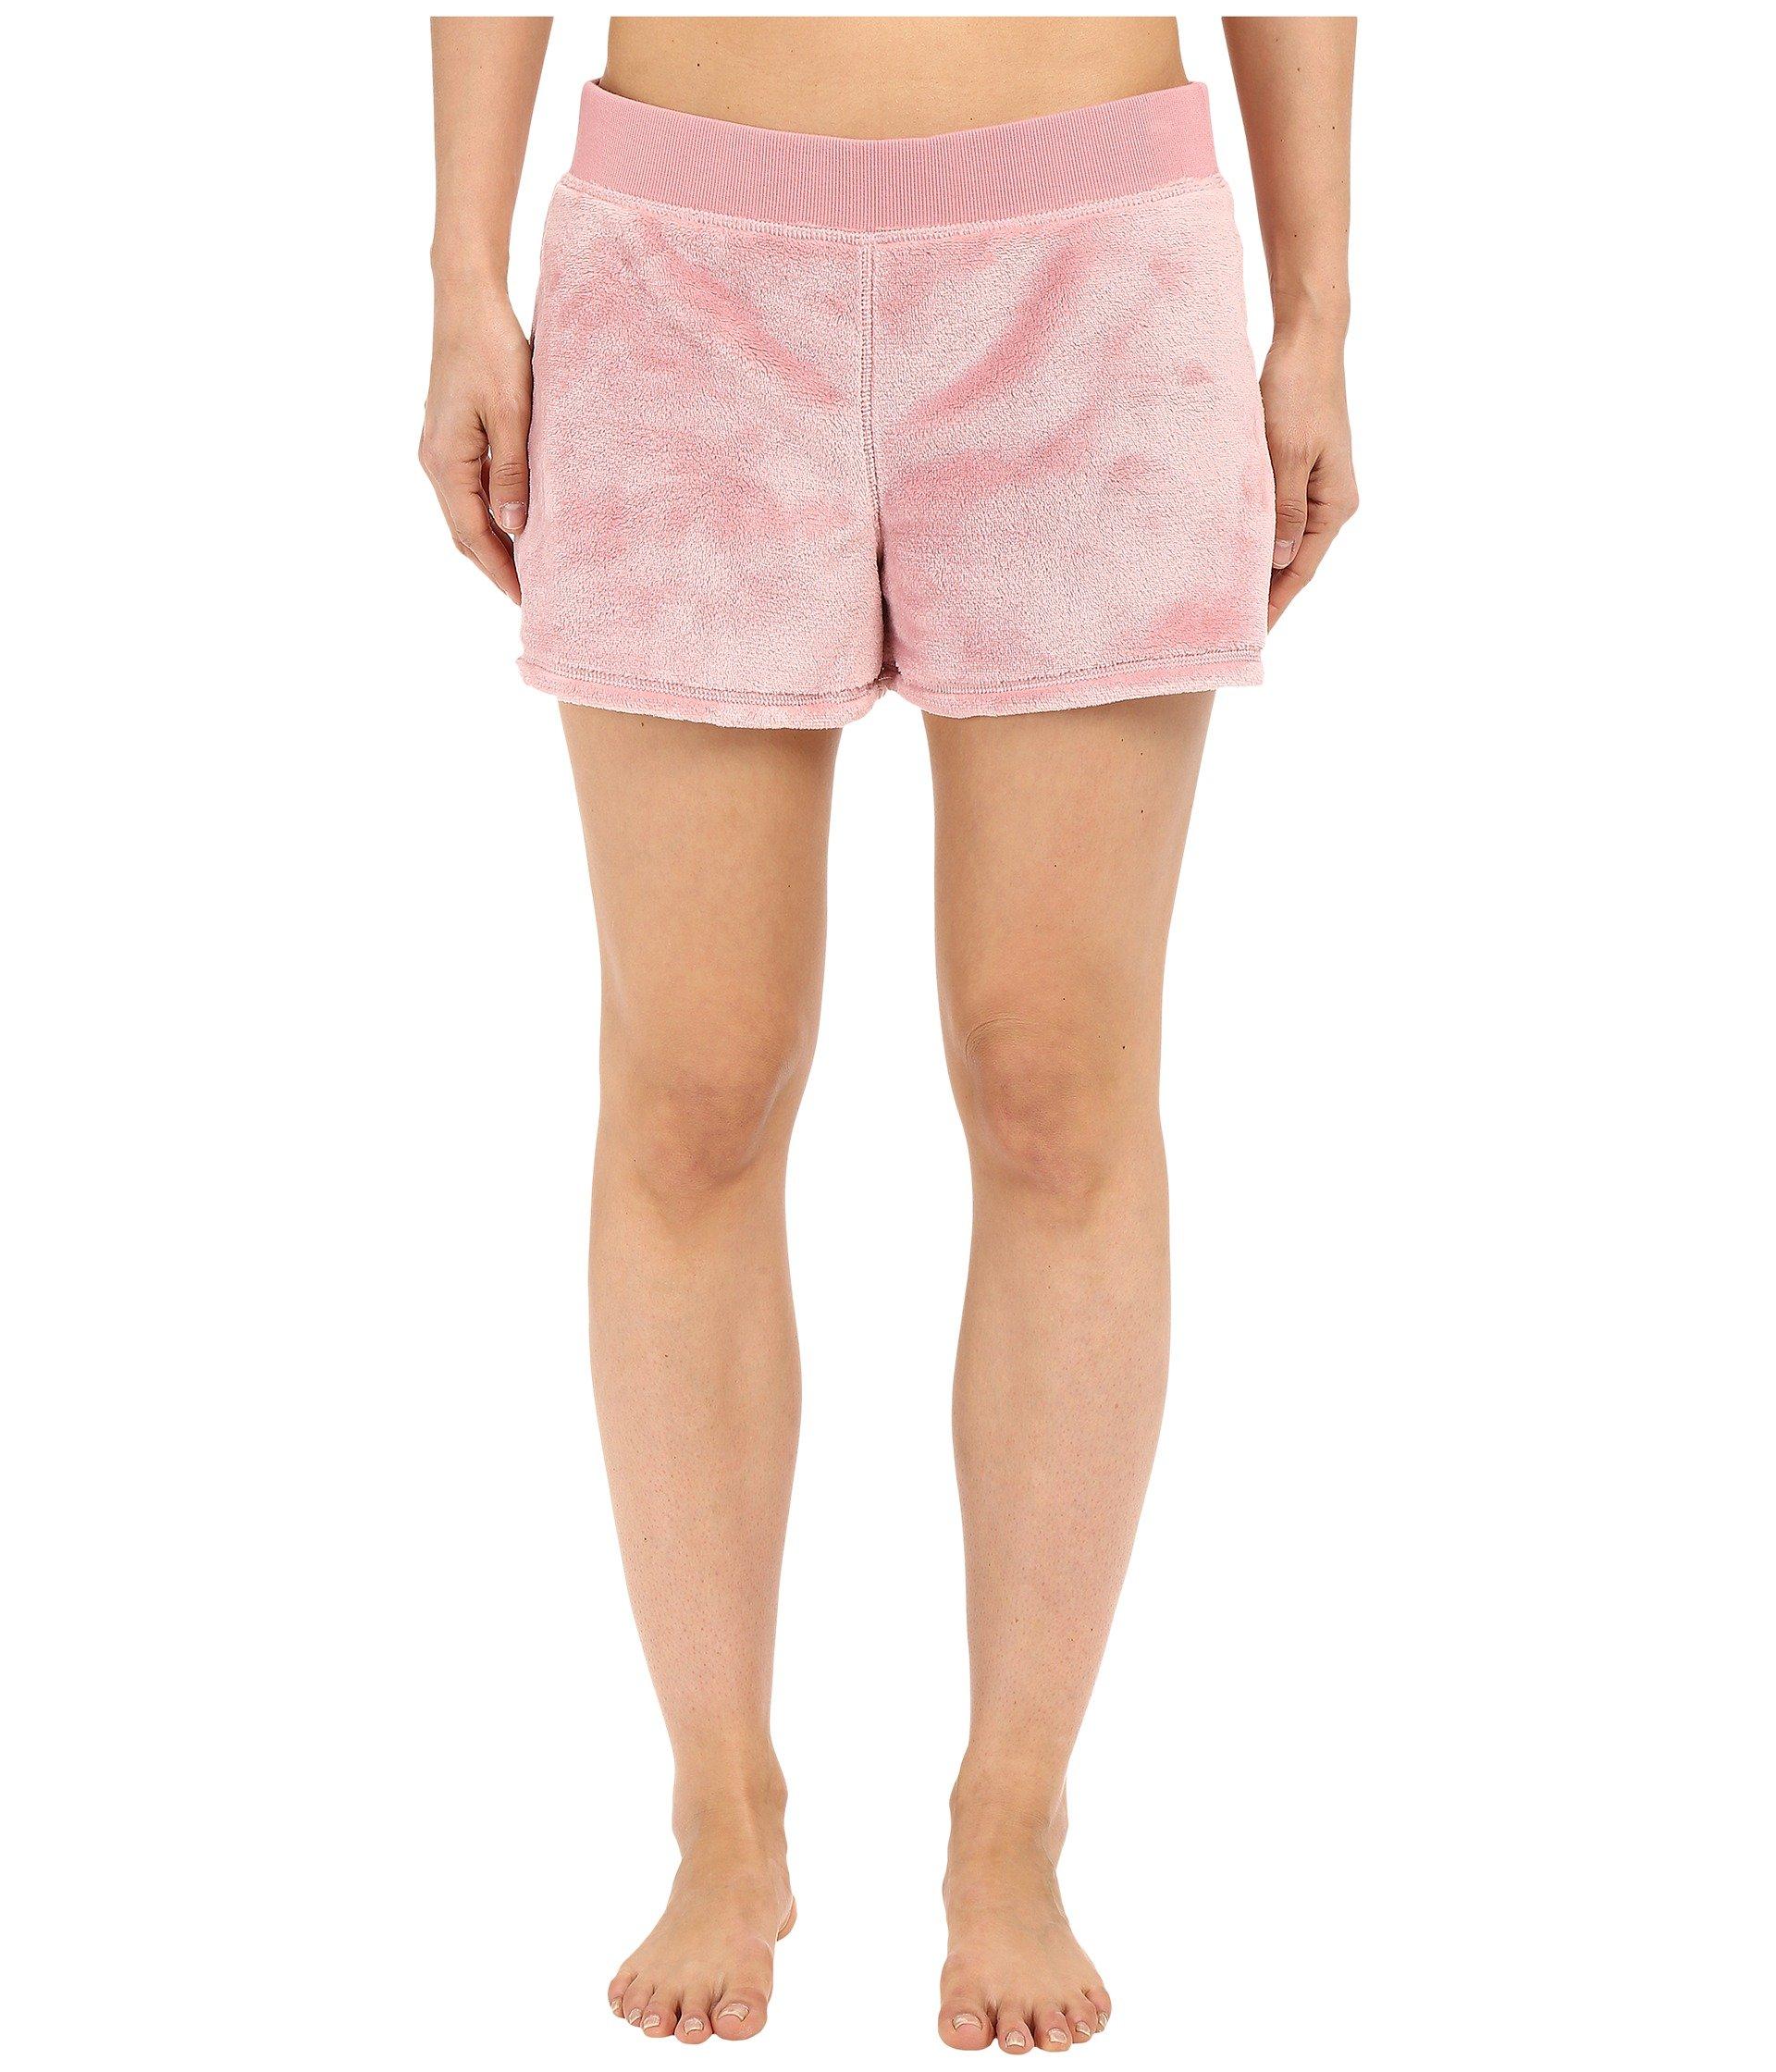 Pantalón de Pijama para Mujer UGG Kerra Shorts  + UGG en VeoyCompro.net